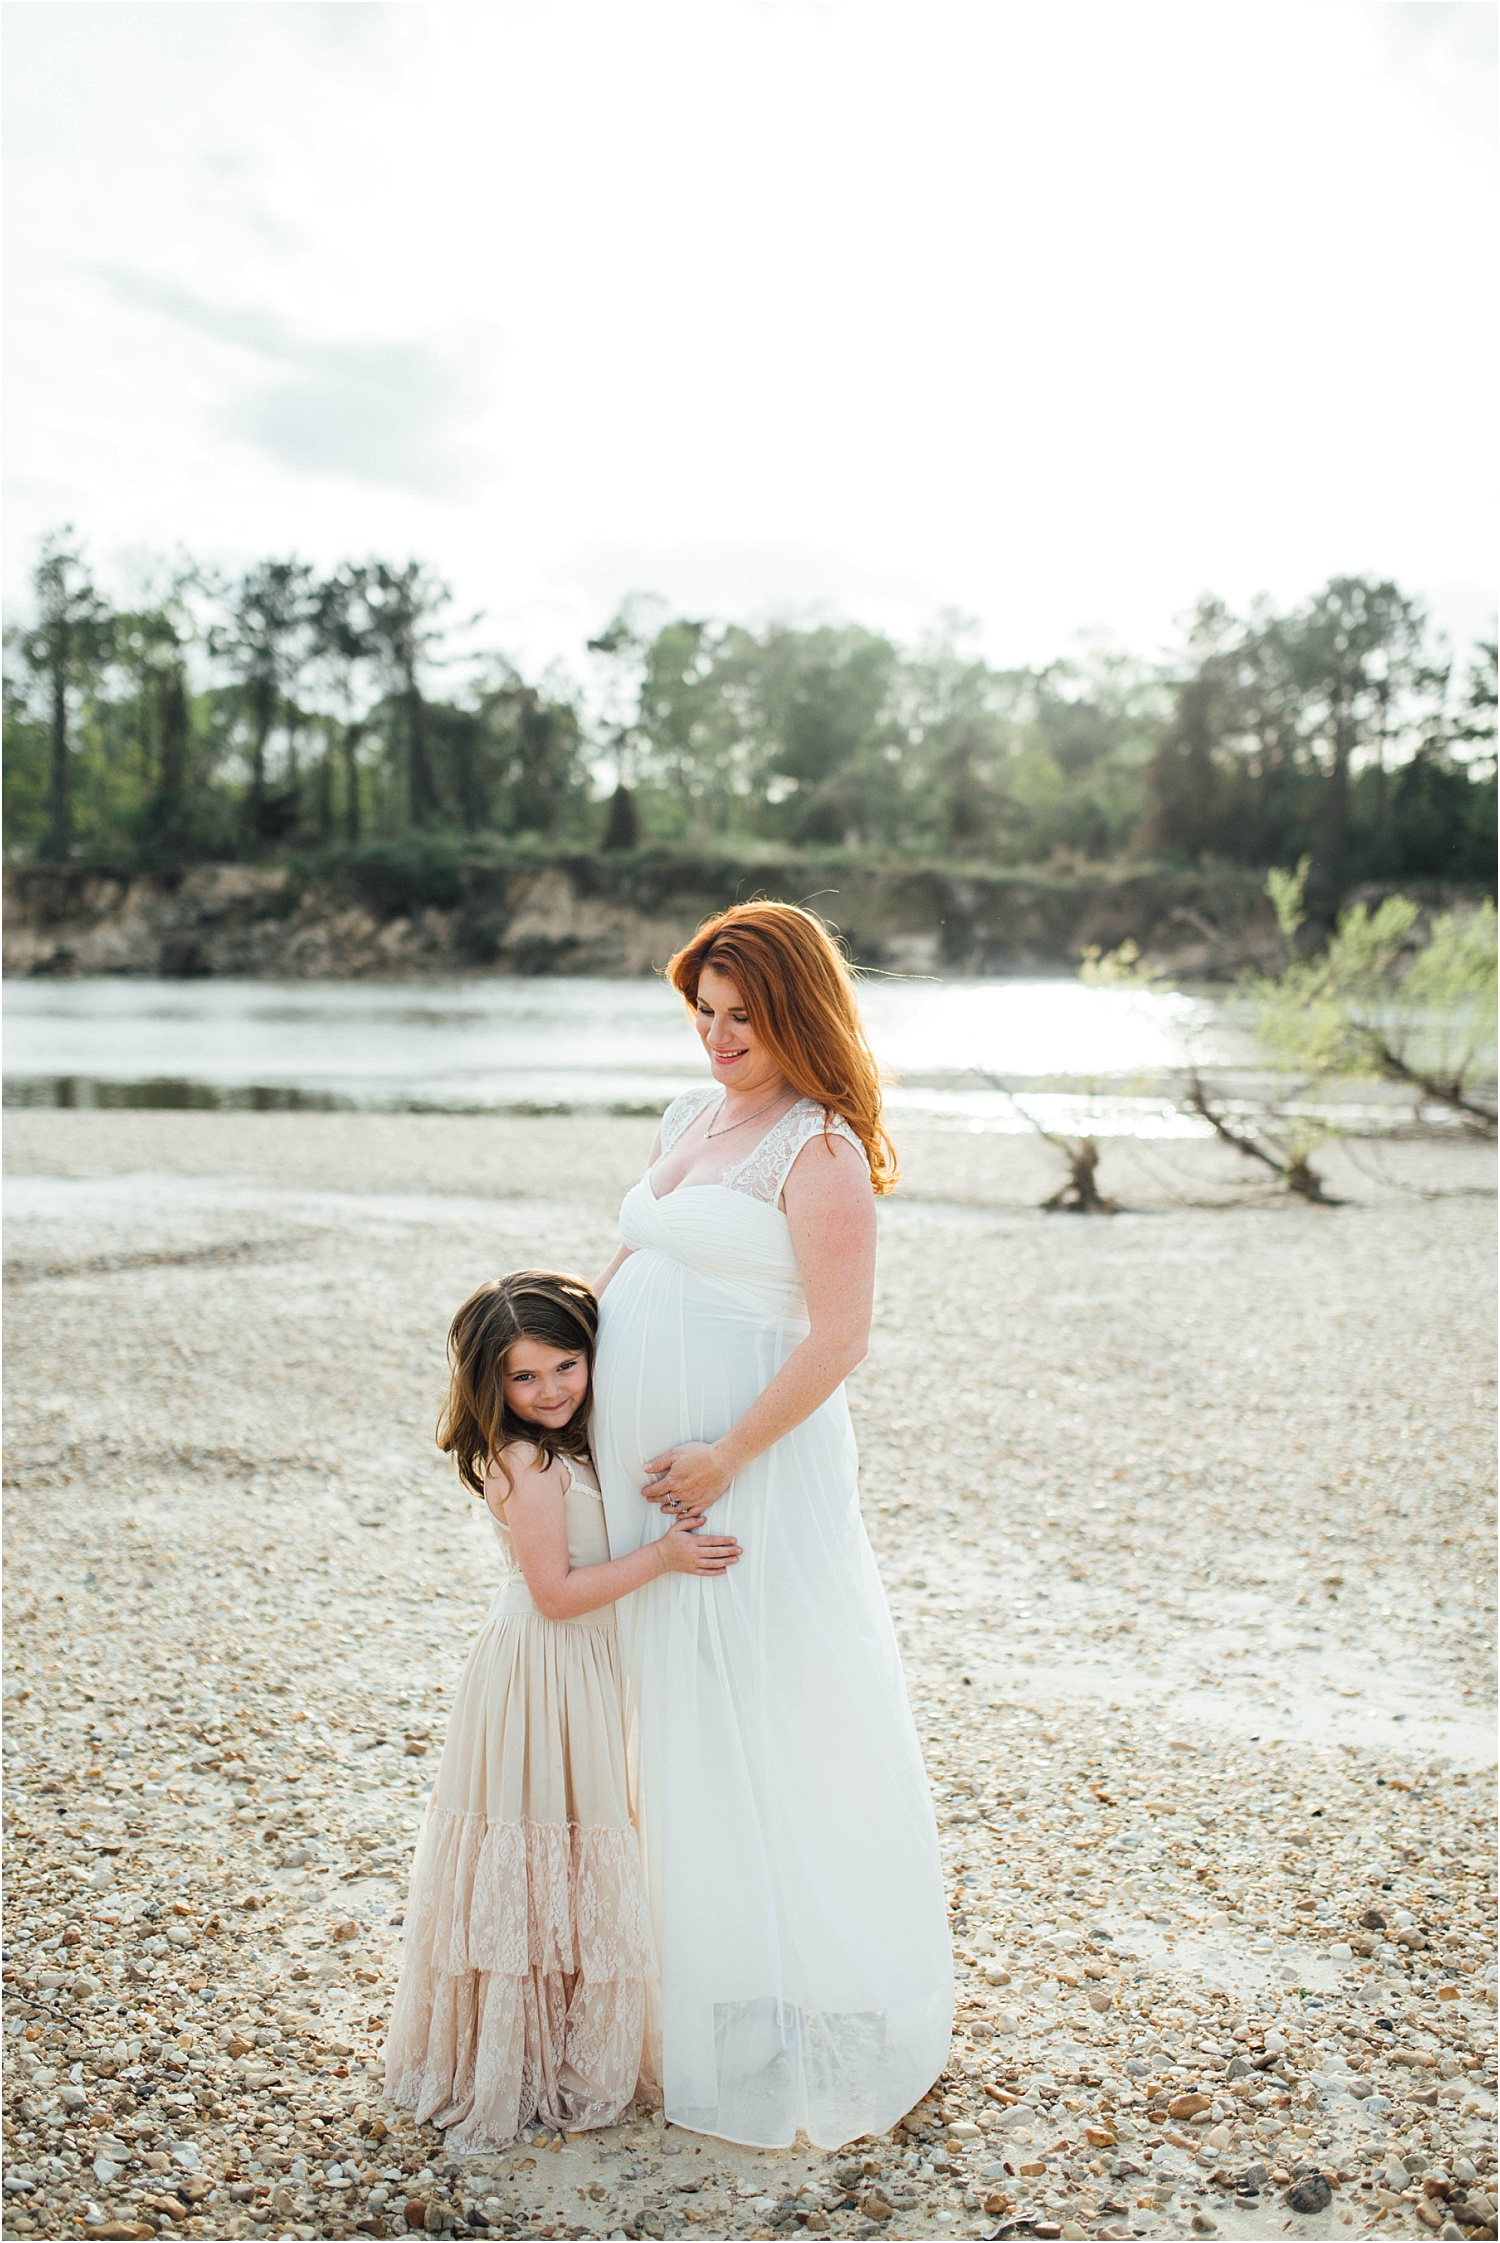 Sarah + Charlotte-Mommy-and-Me-Amite-River-Maternity-Photos_Gabby Chapin_Print_0003_BLOG.jpg